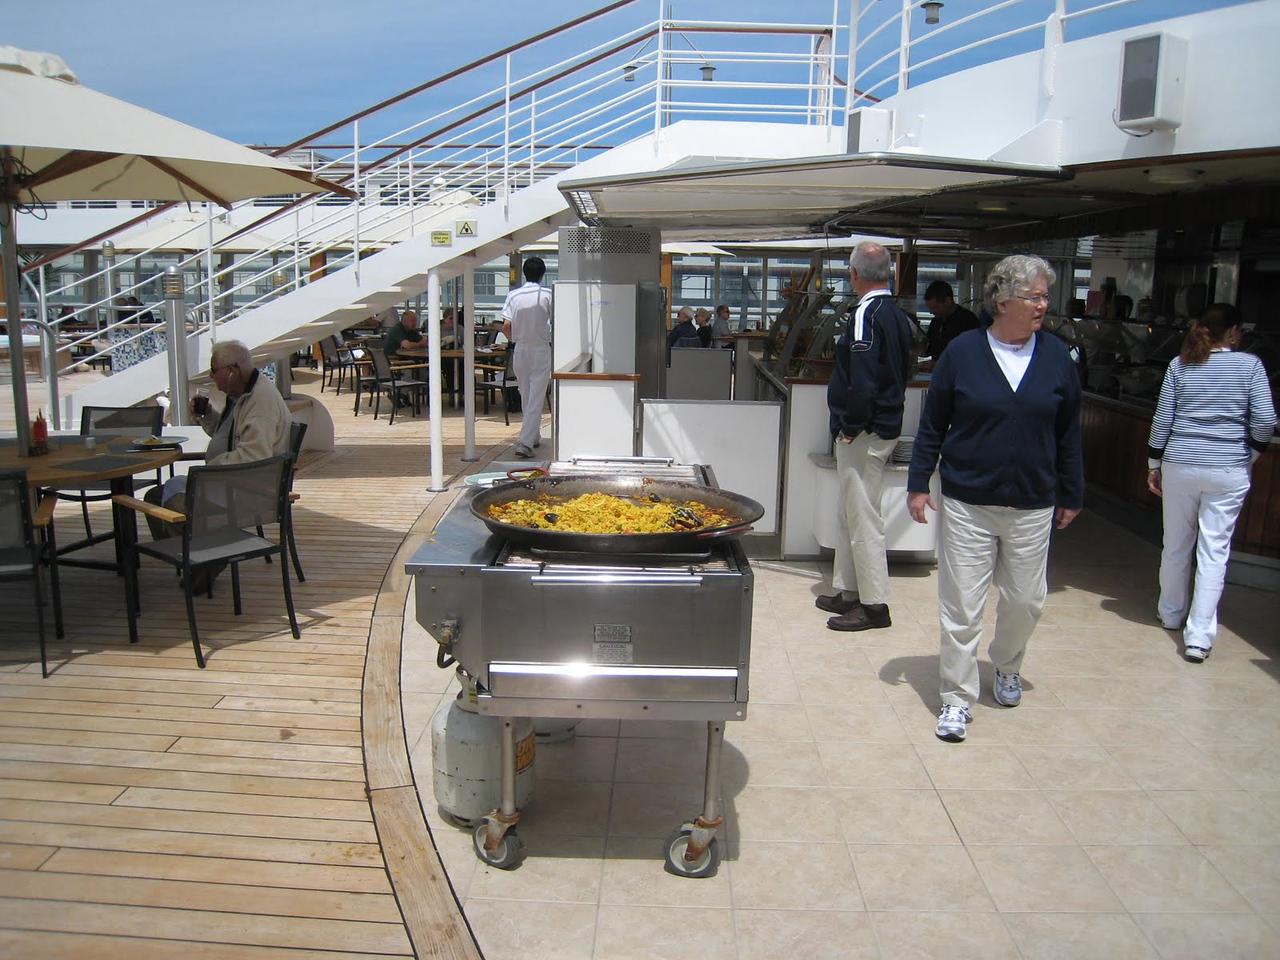 Paella on deck!